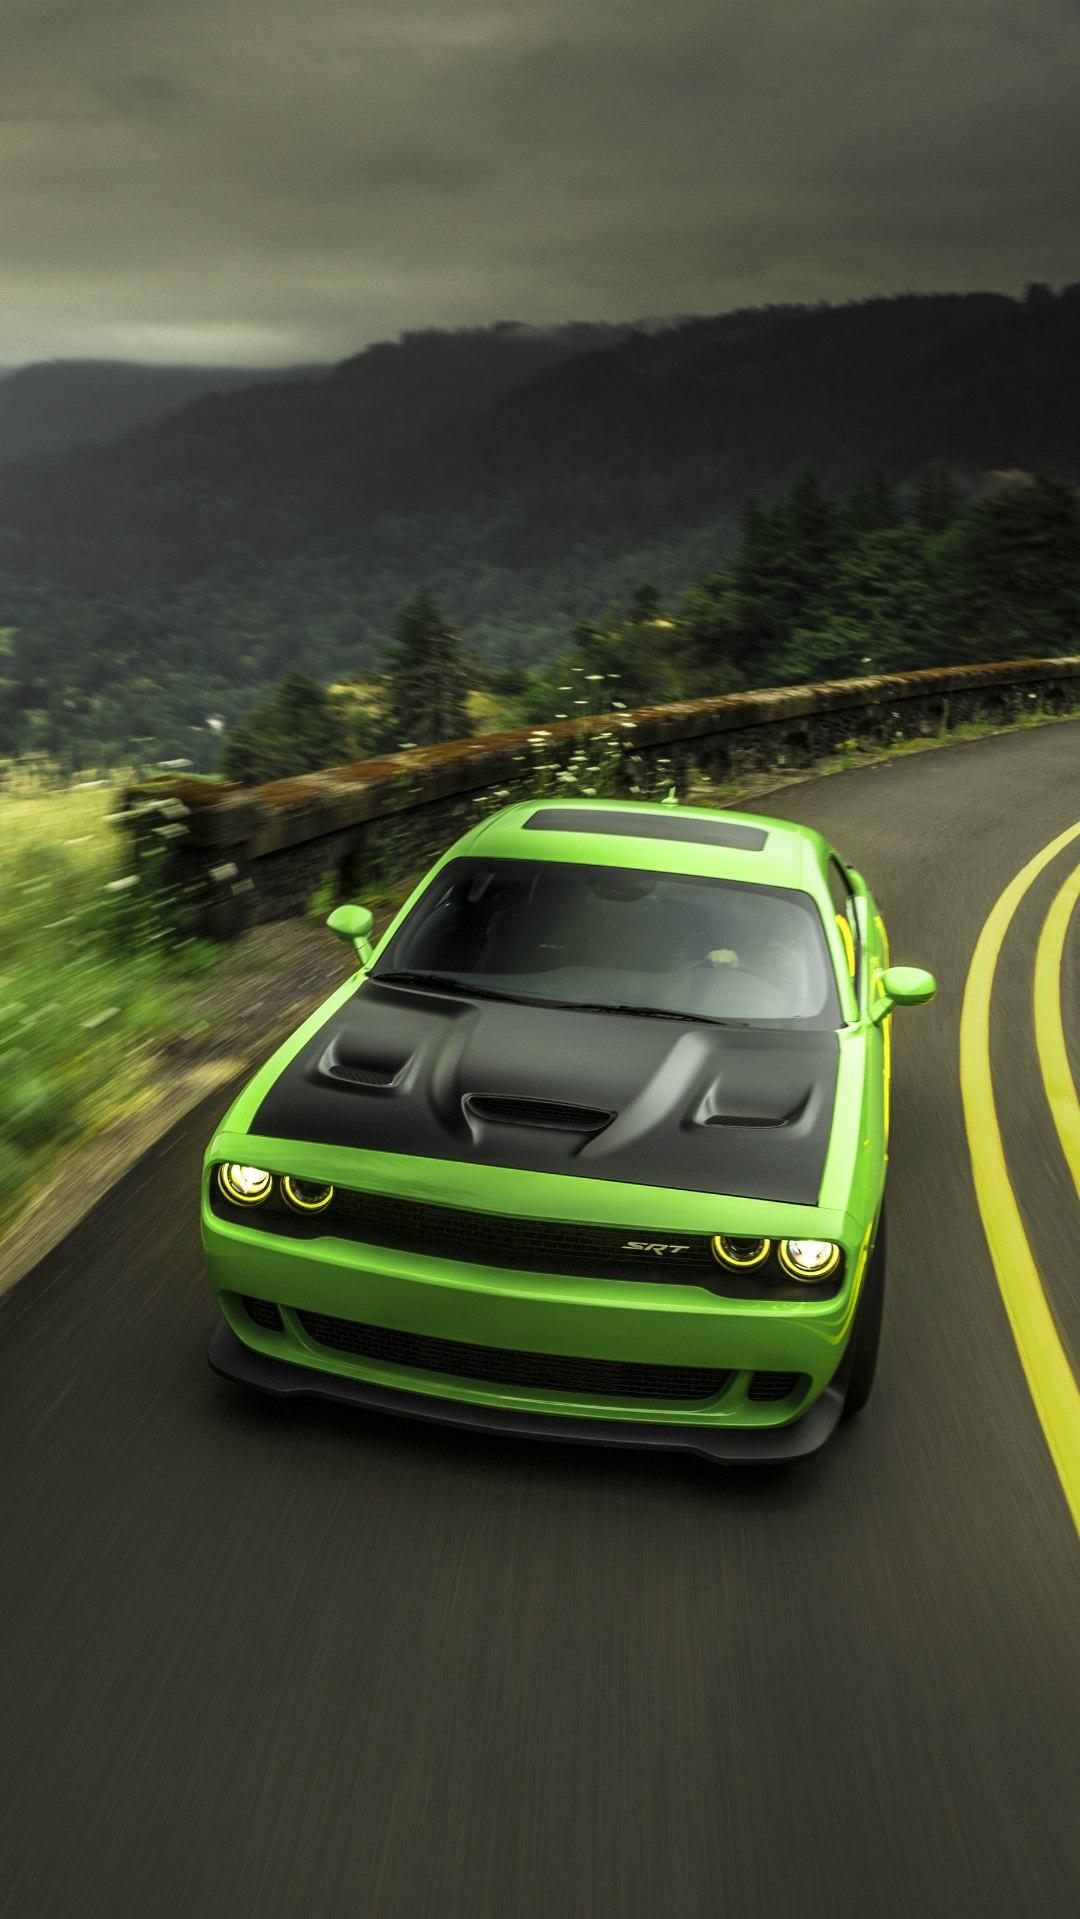 Dodge Challenger Srt Green Iphone Wallpaper Iphone